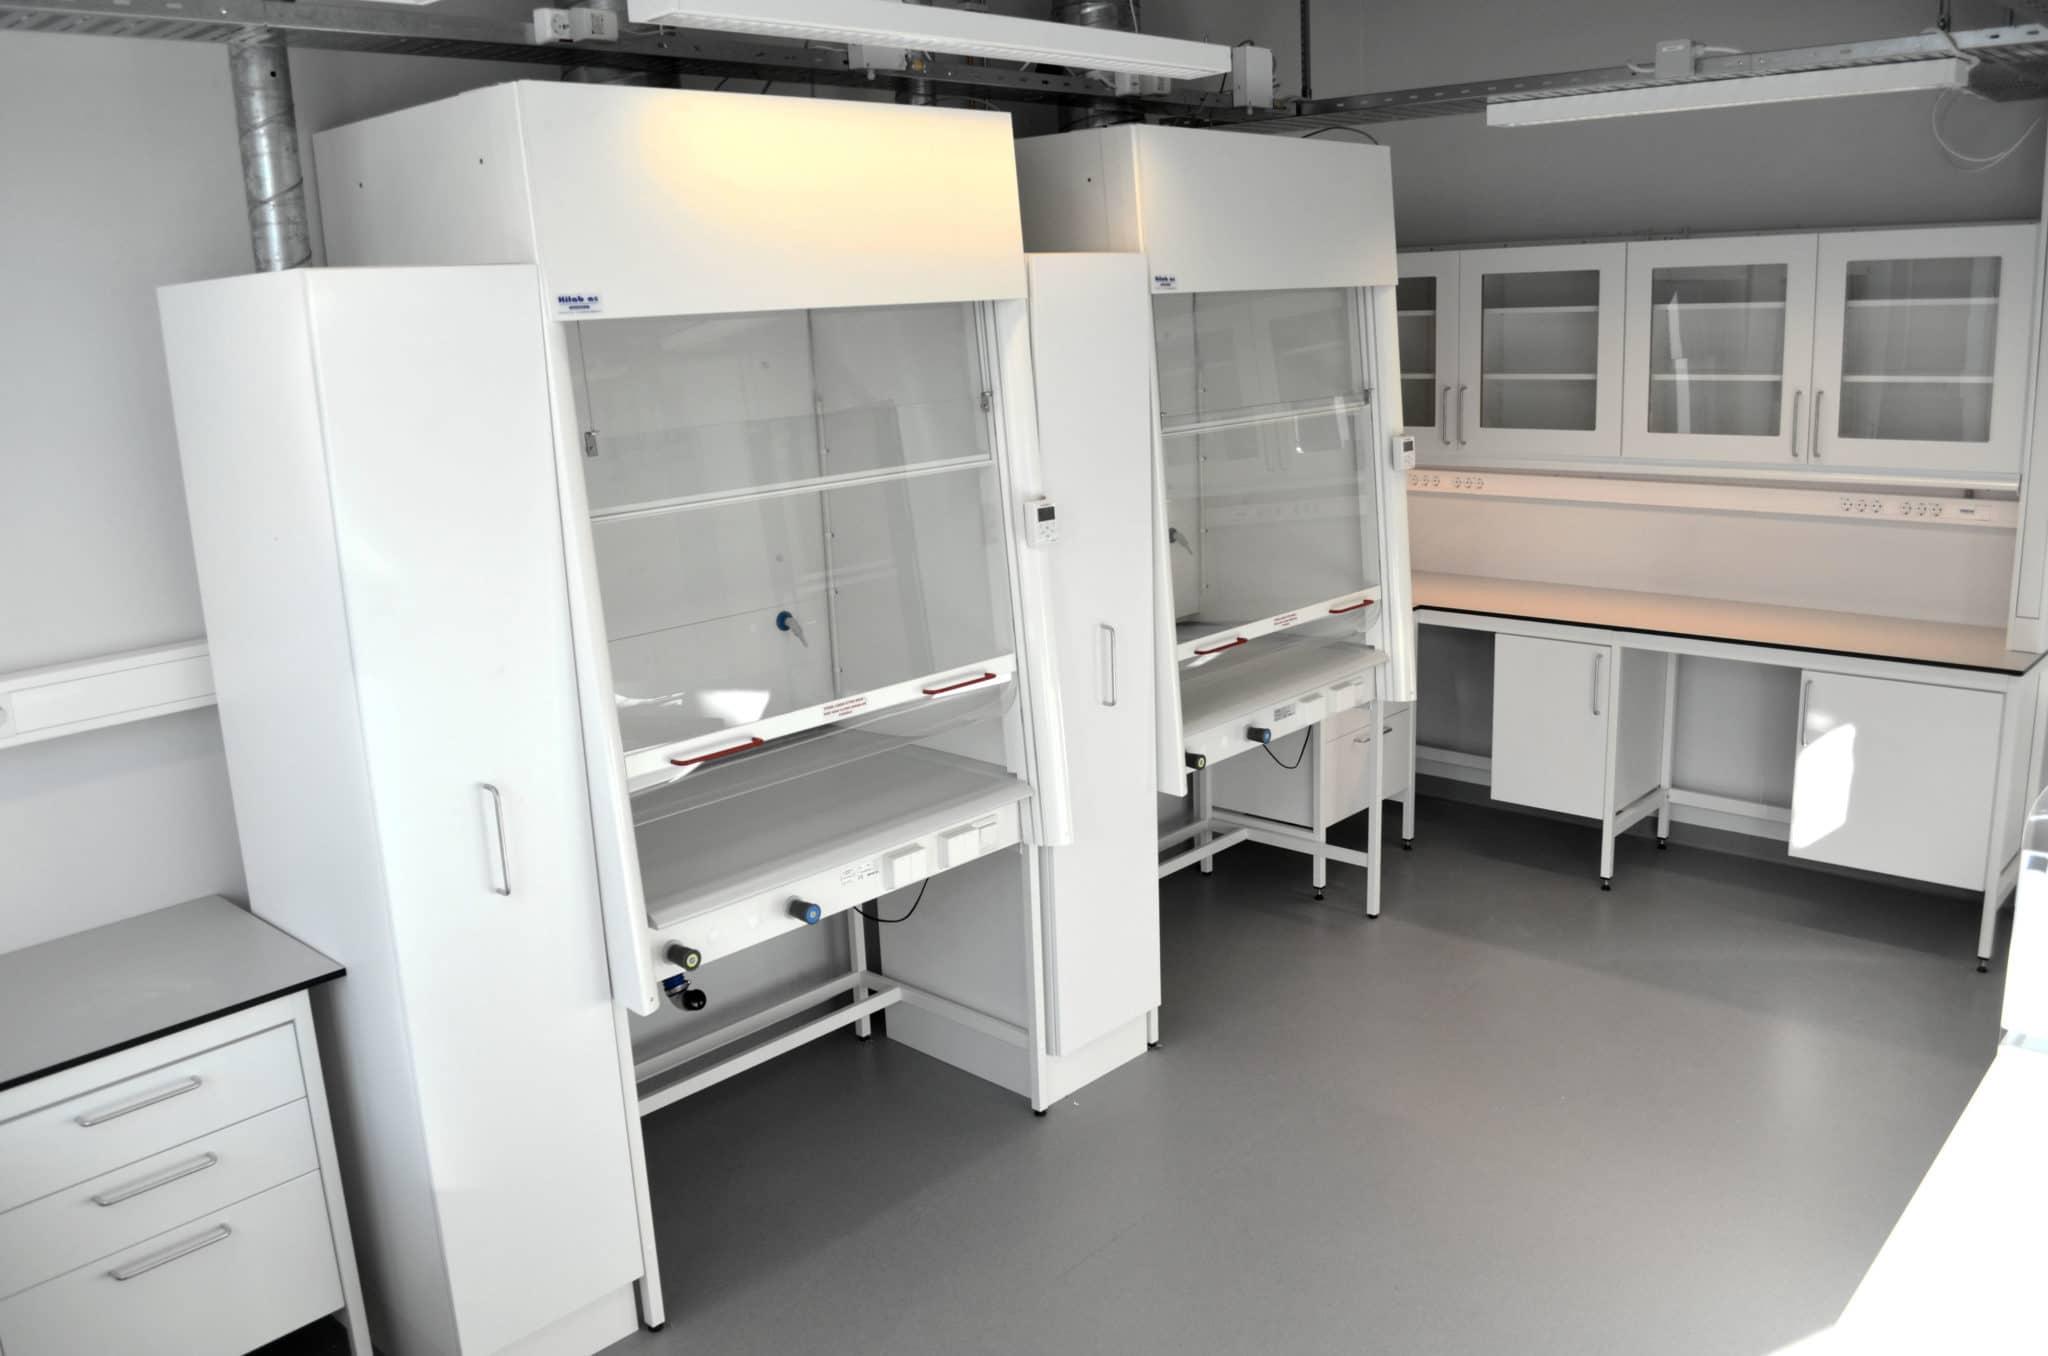 avtrekkskap i laboratorium